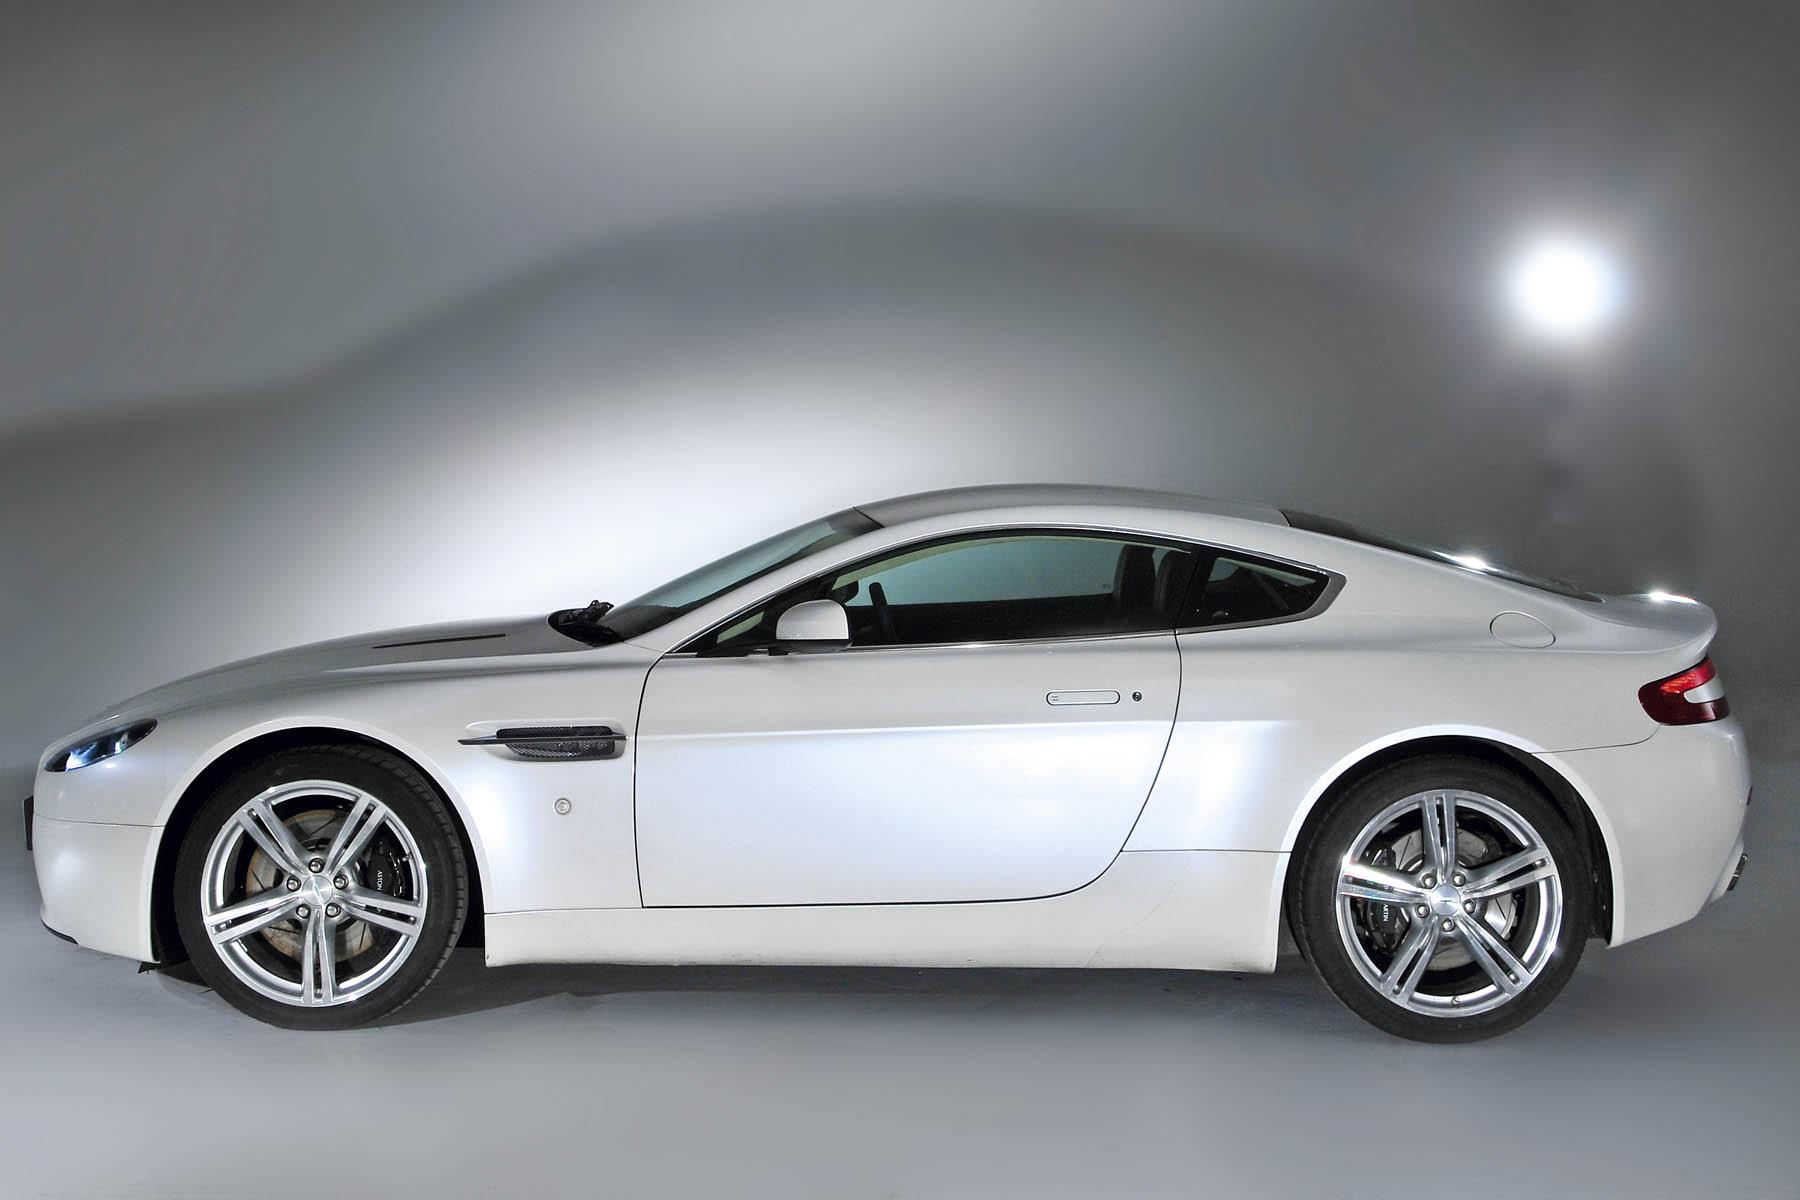 Aston V8 Vantage Vs Bentley Continental Gt Auto Express